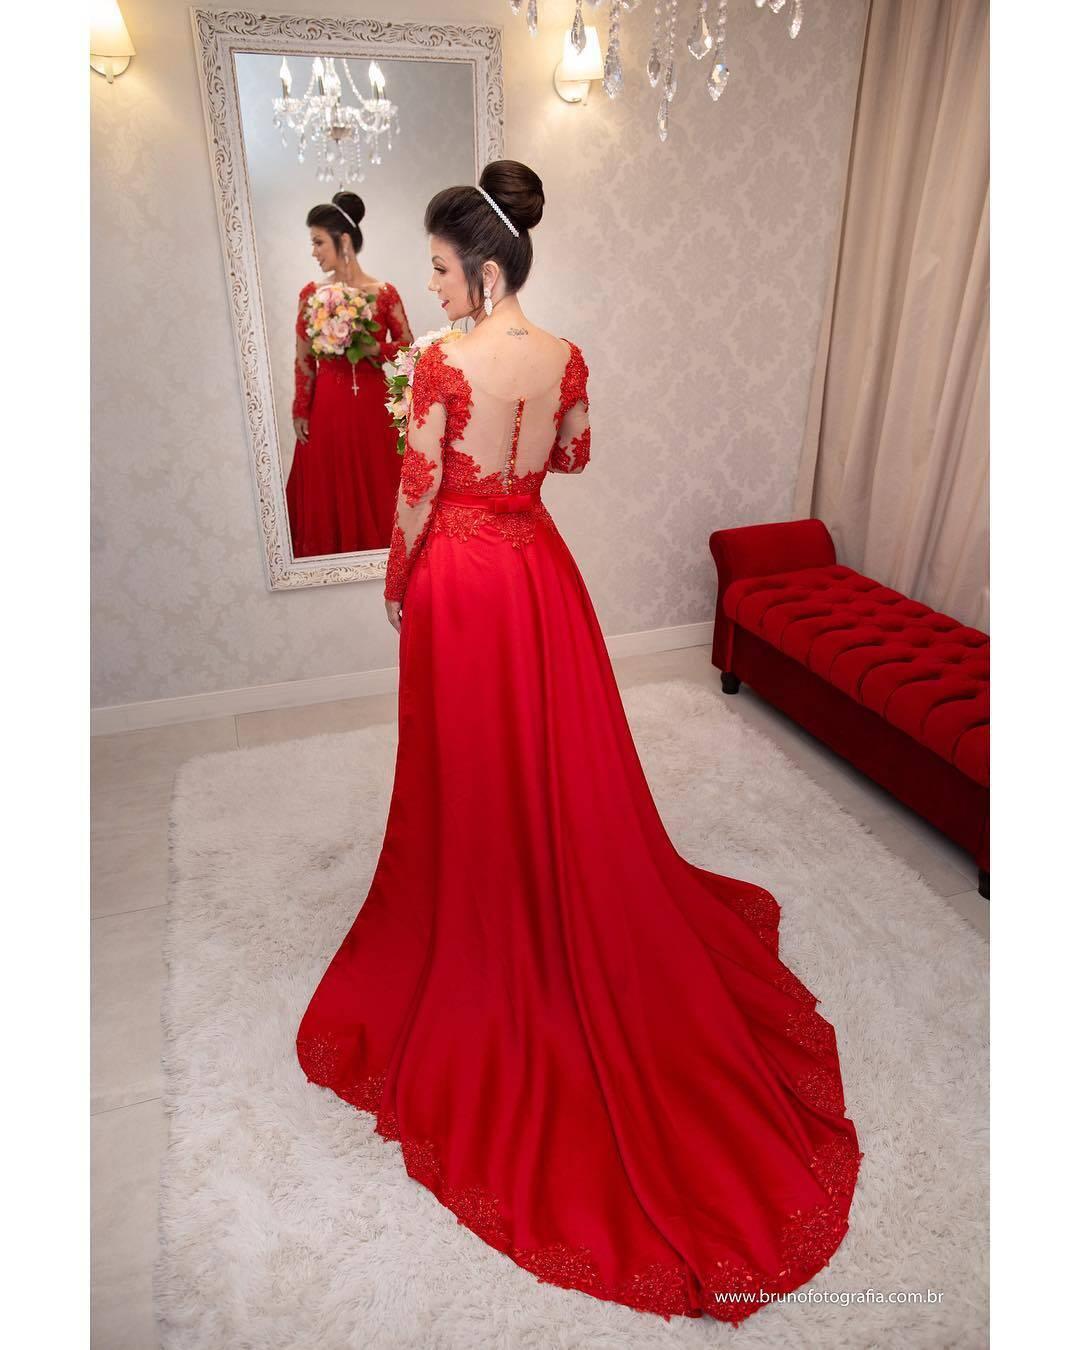 Noiva de vermelho. Foto:  brunorodolphofotografia